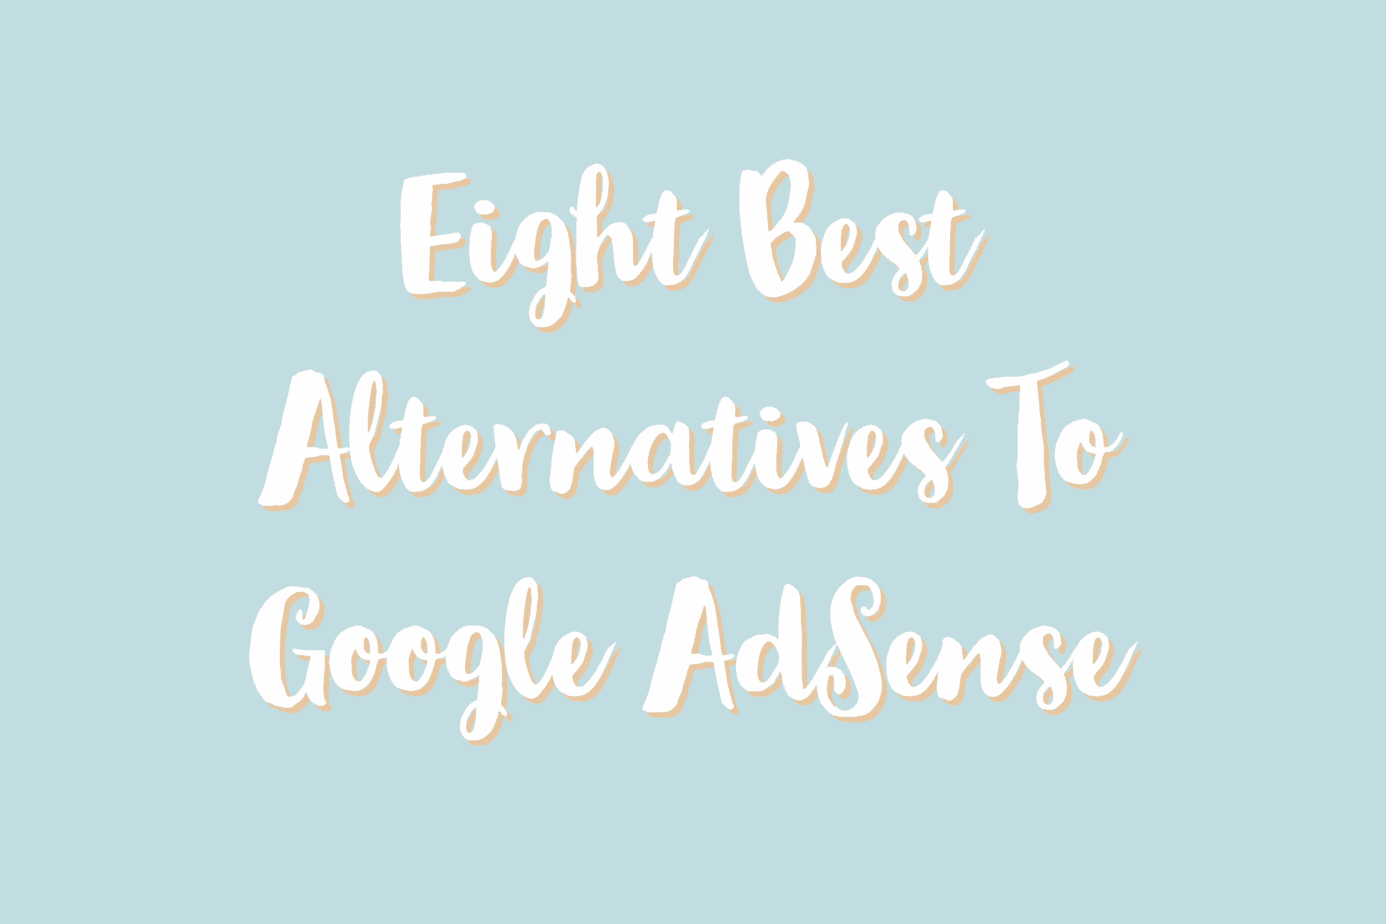 Eight best alternatives to Google AdSense